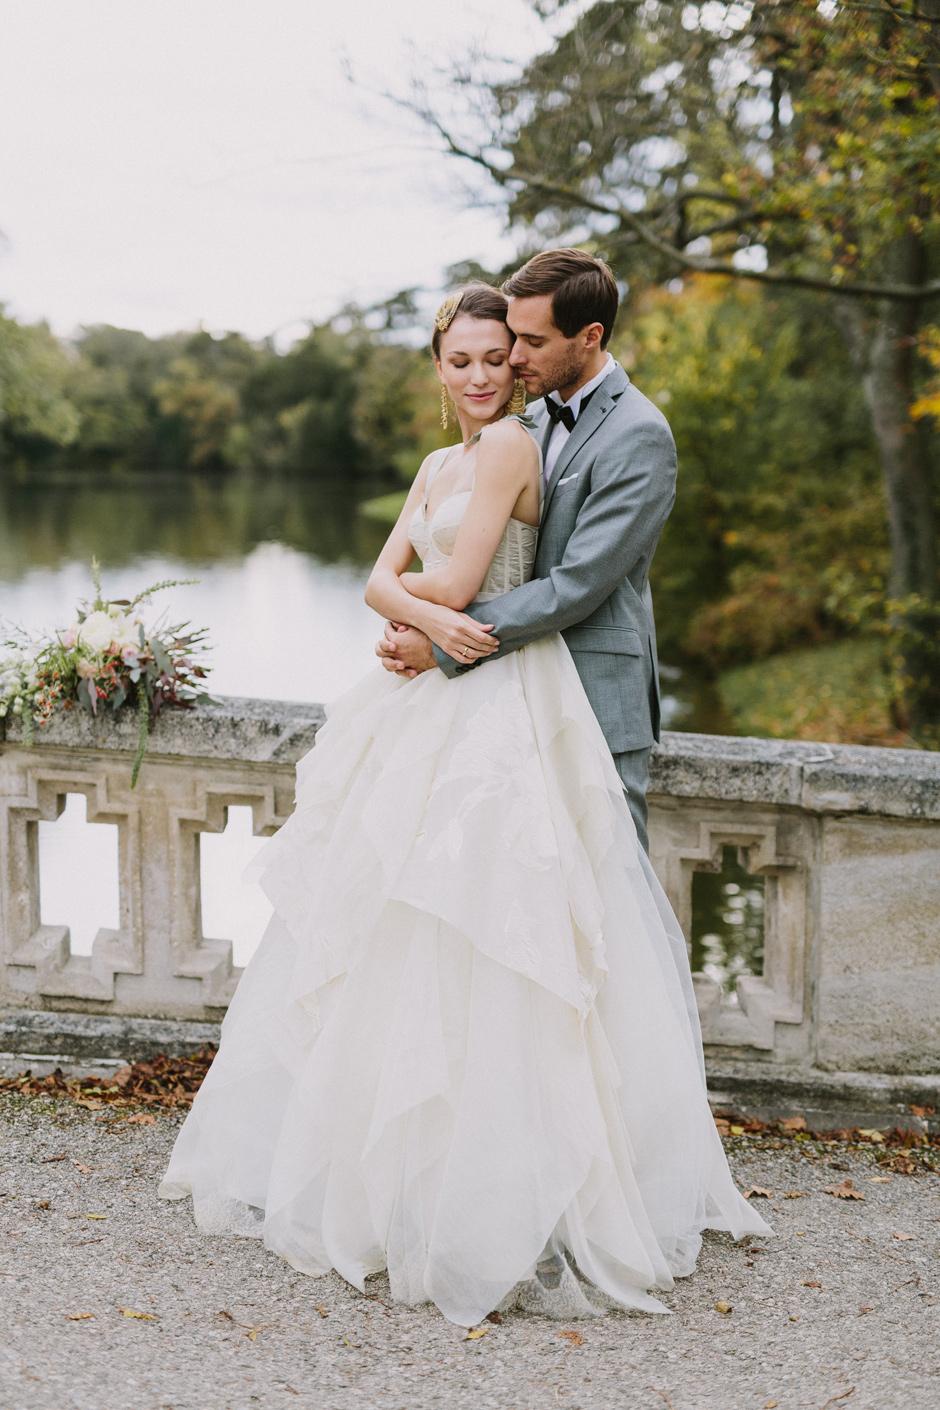 laxenburg-wedding-photographer-038